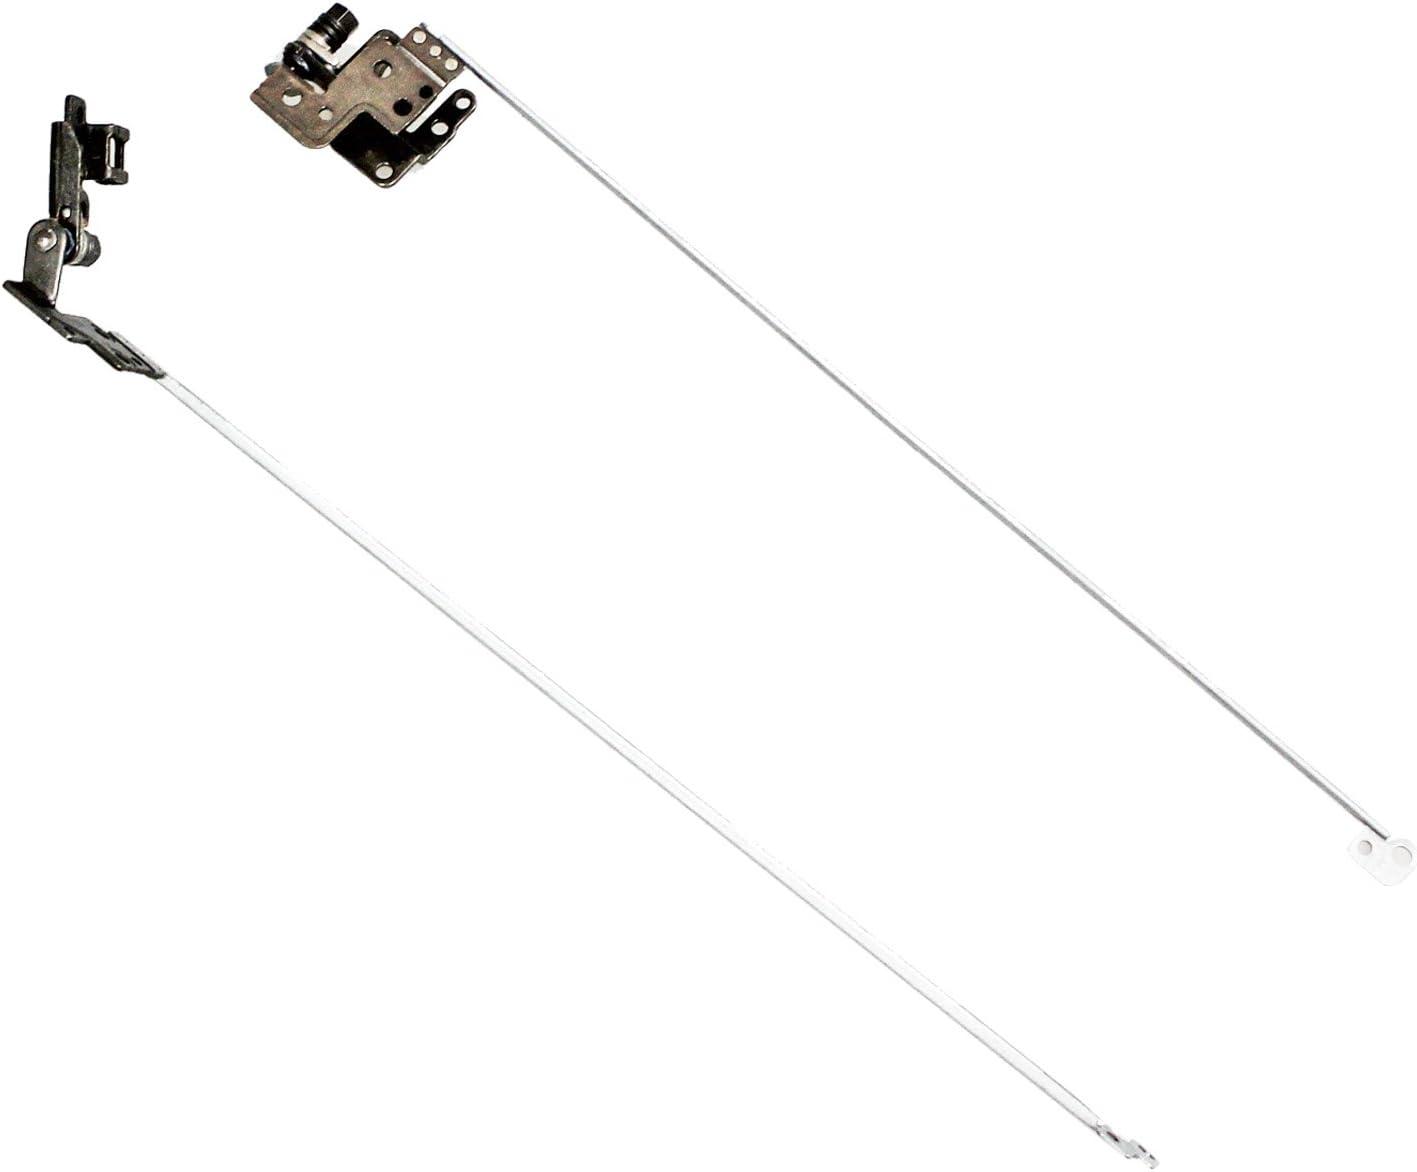 GinTai LCD Hinges Set Replacement for Acer Aspire E5-575G-728Q E5-575G-53VG E5-575G-54TU E5-575G-562T